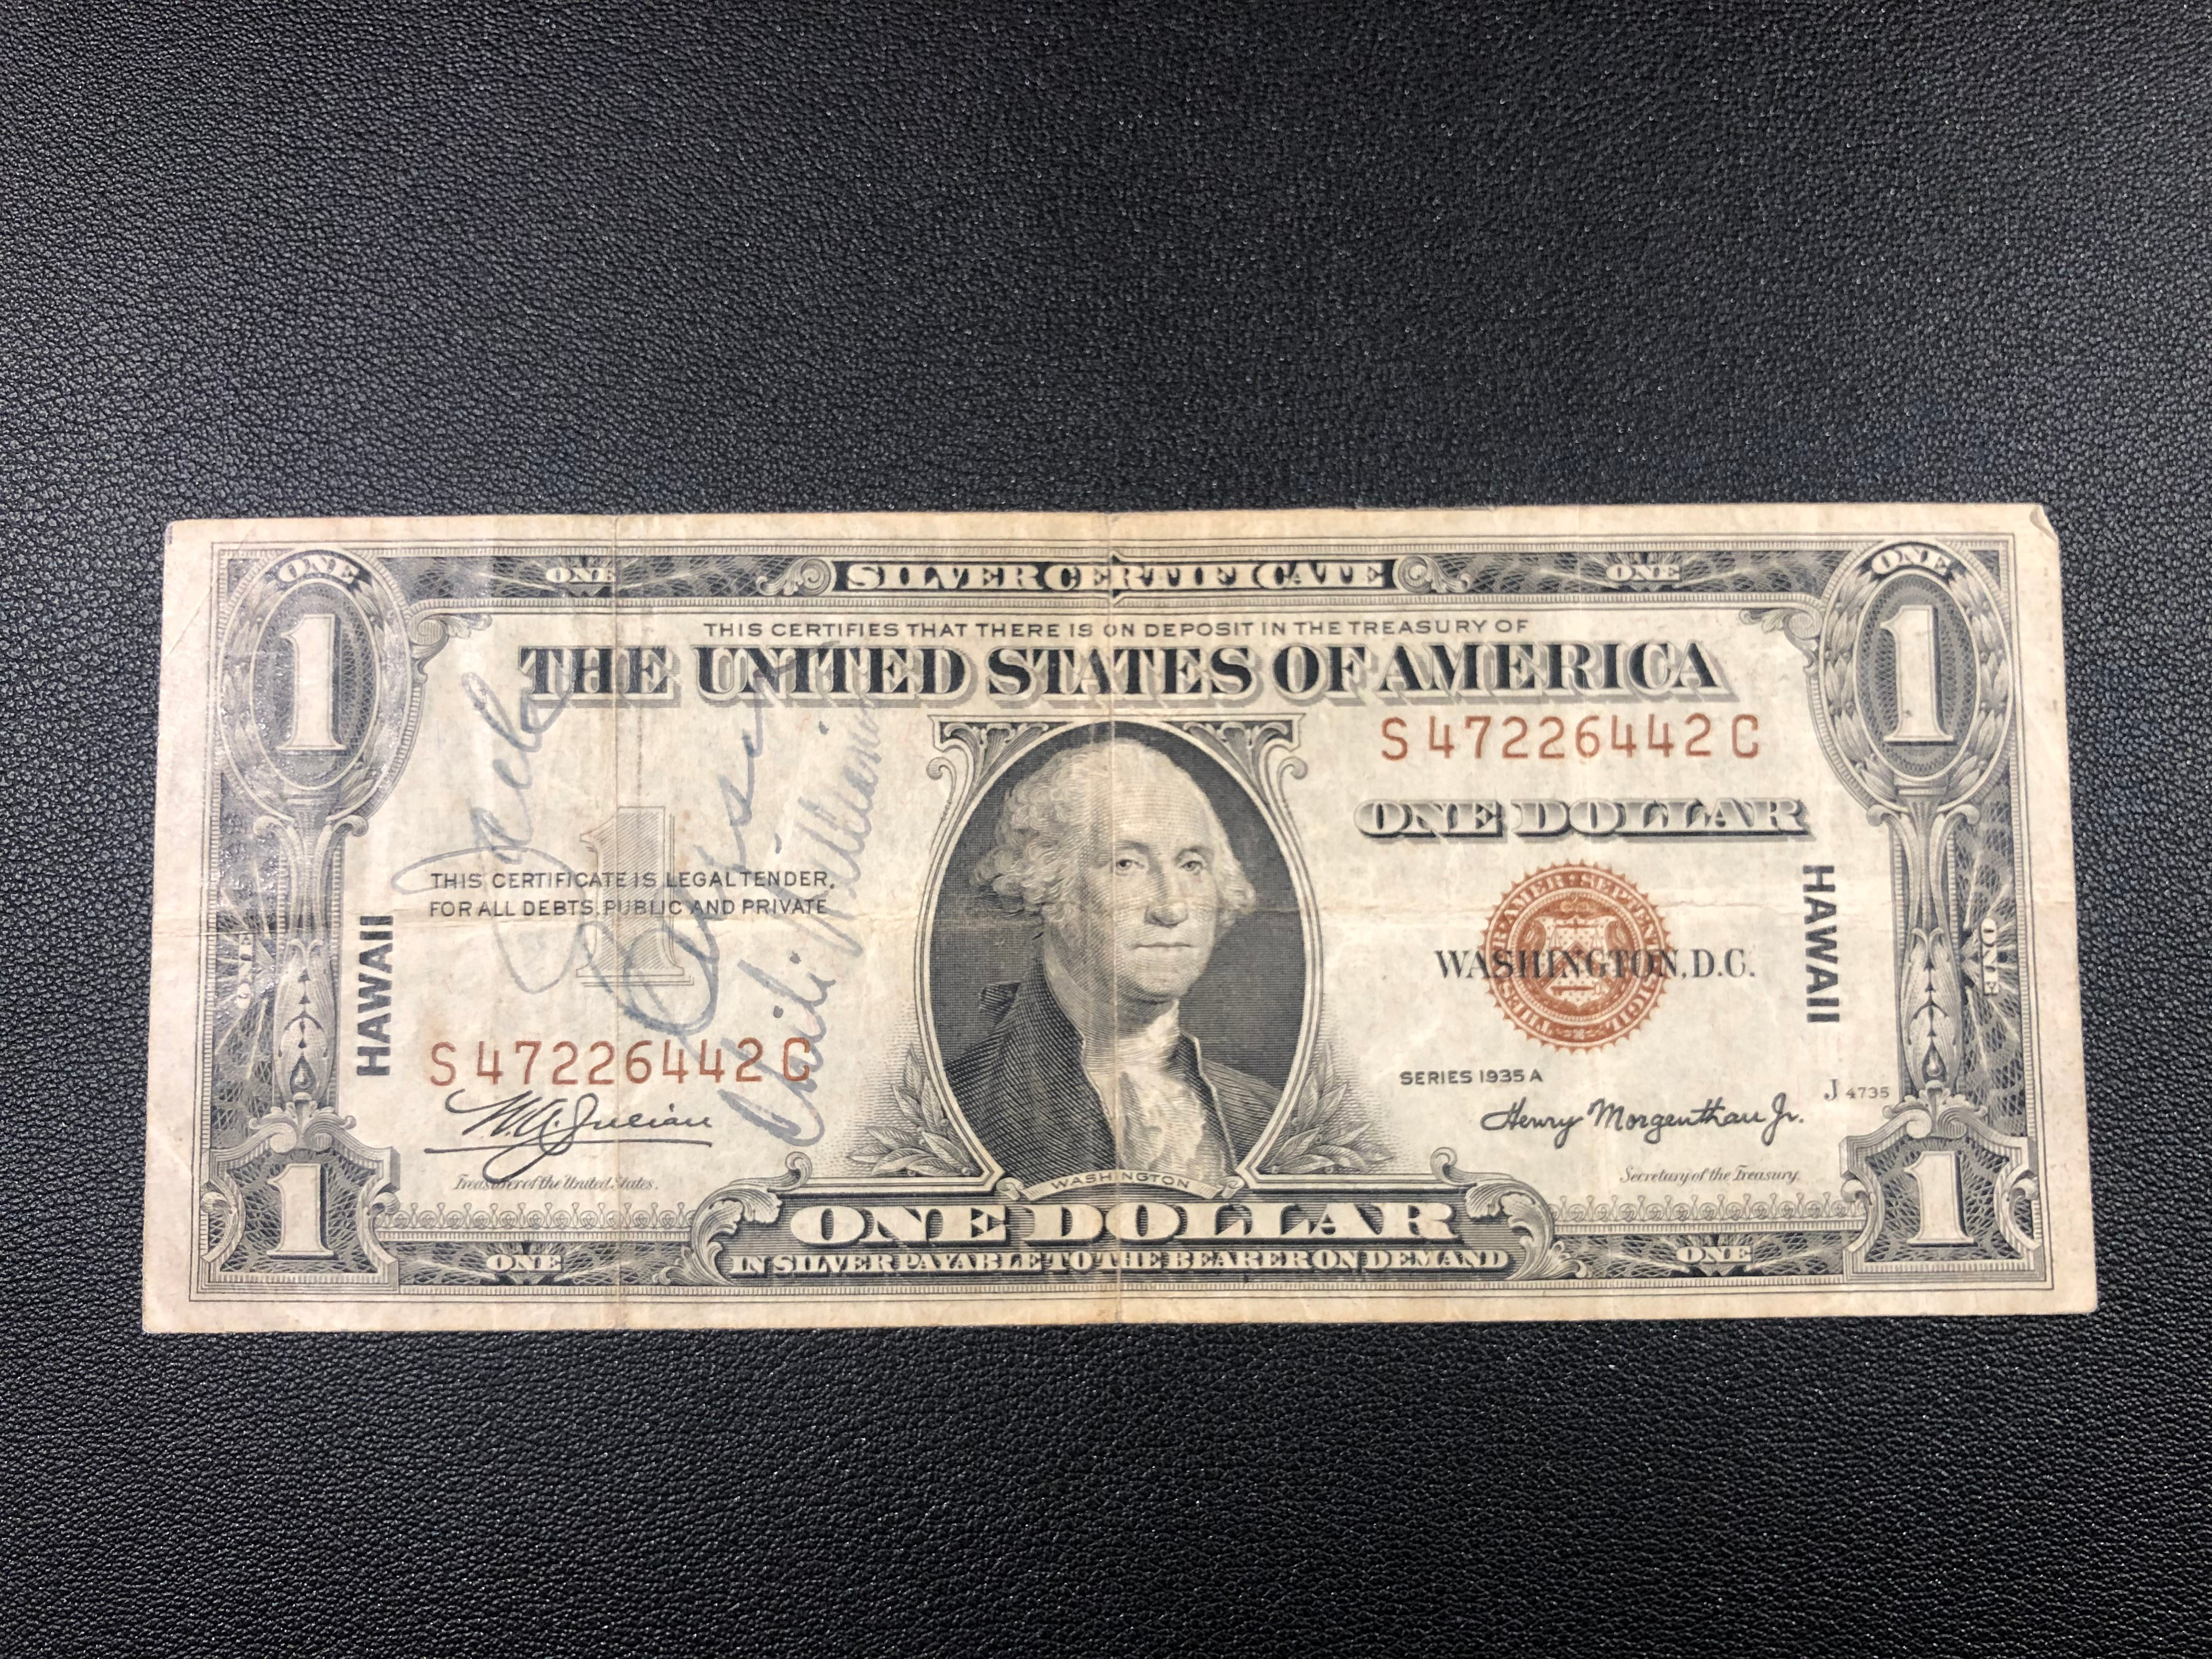 Short Snorter $1 Hawaii Jack Carson Chili Williams USO Signed.jpg